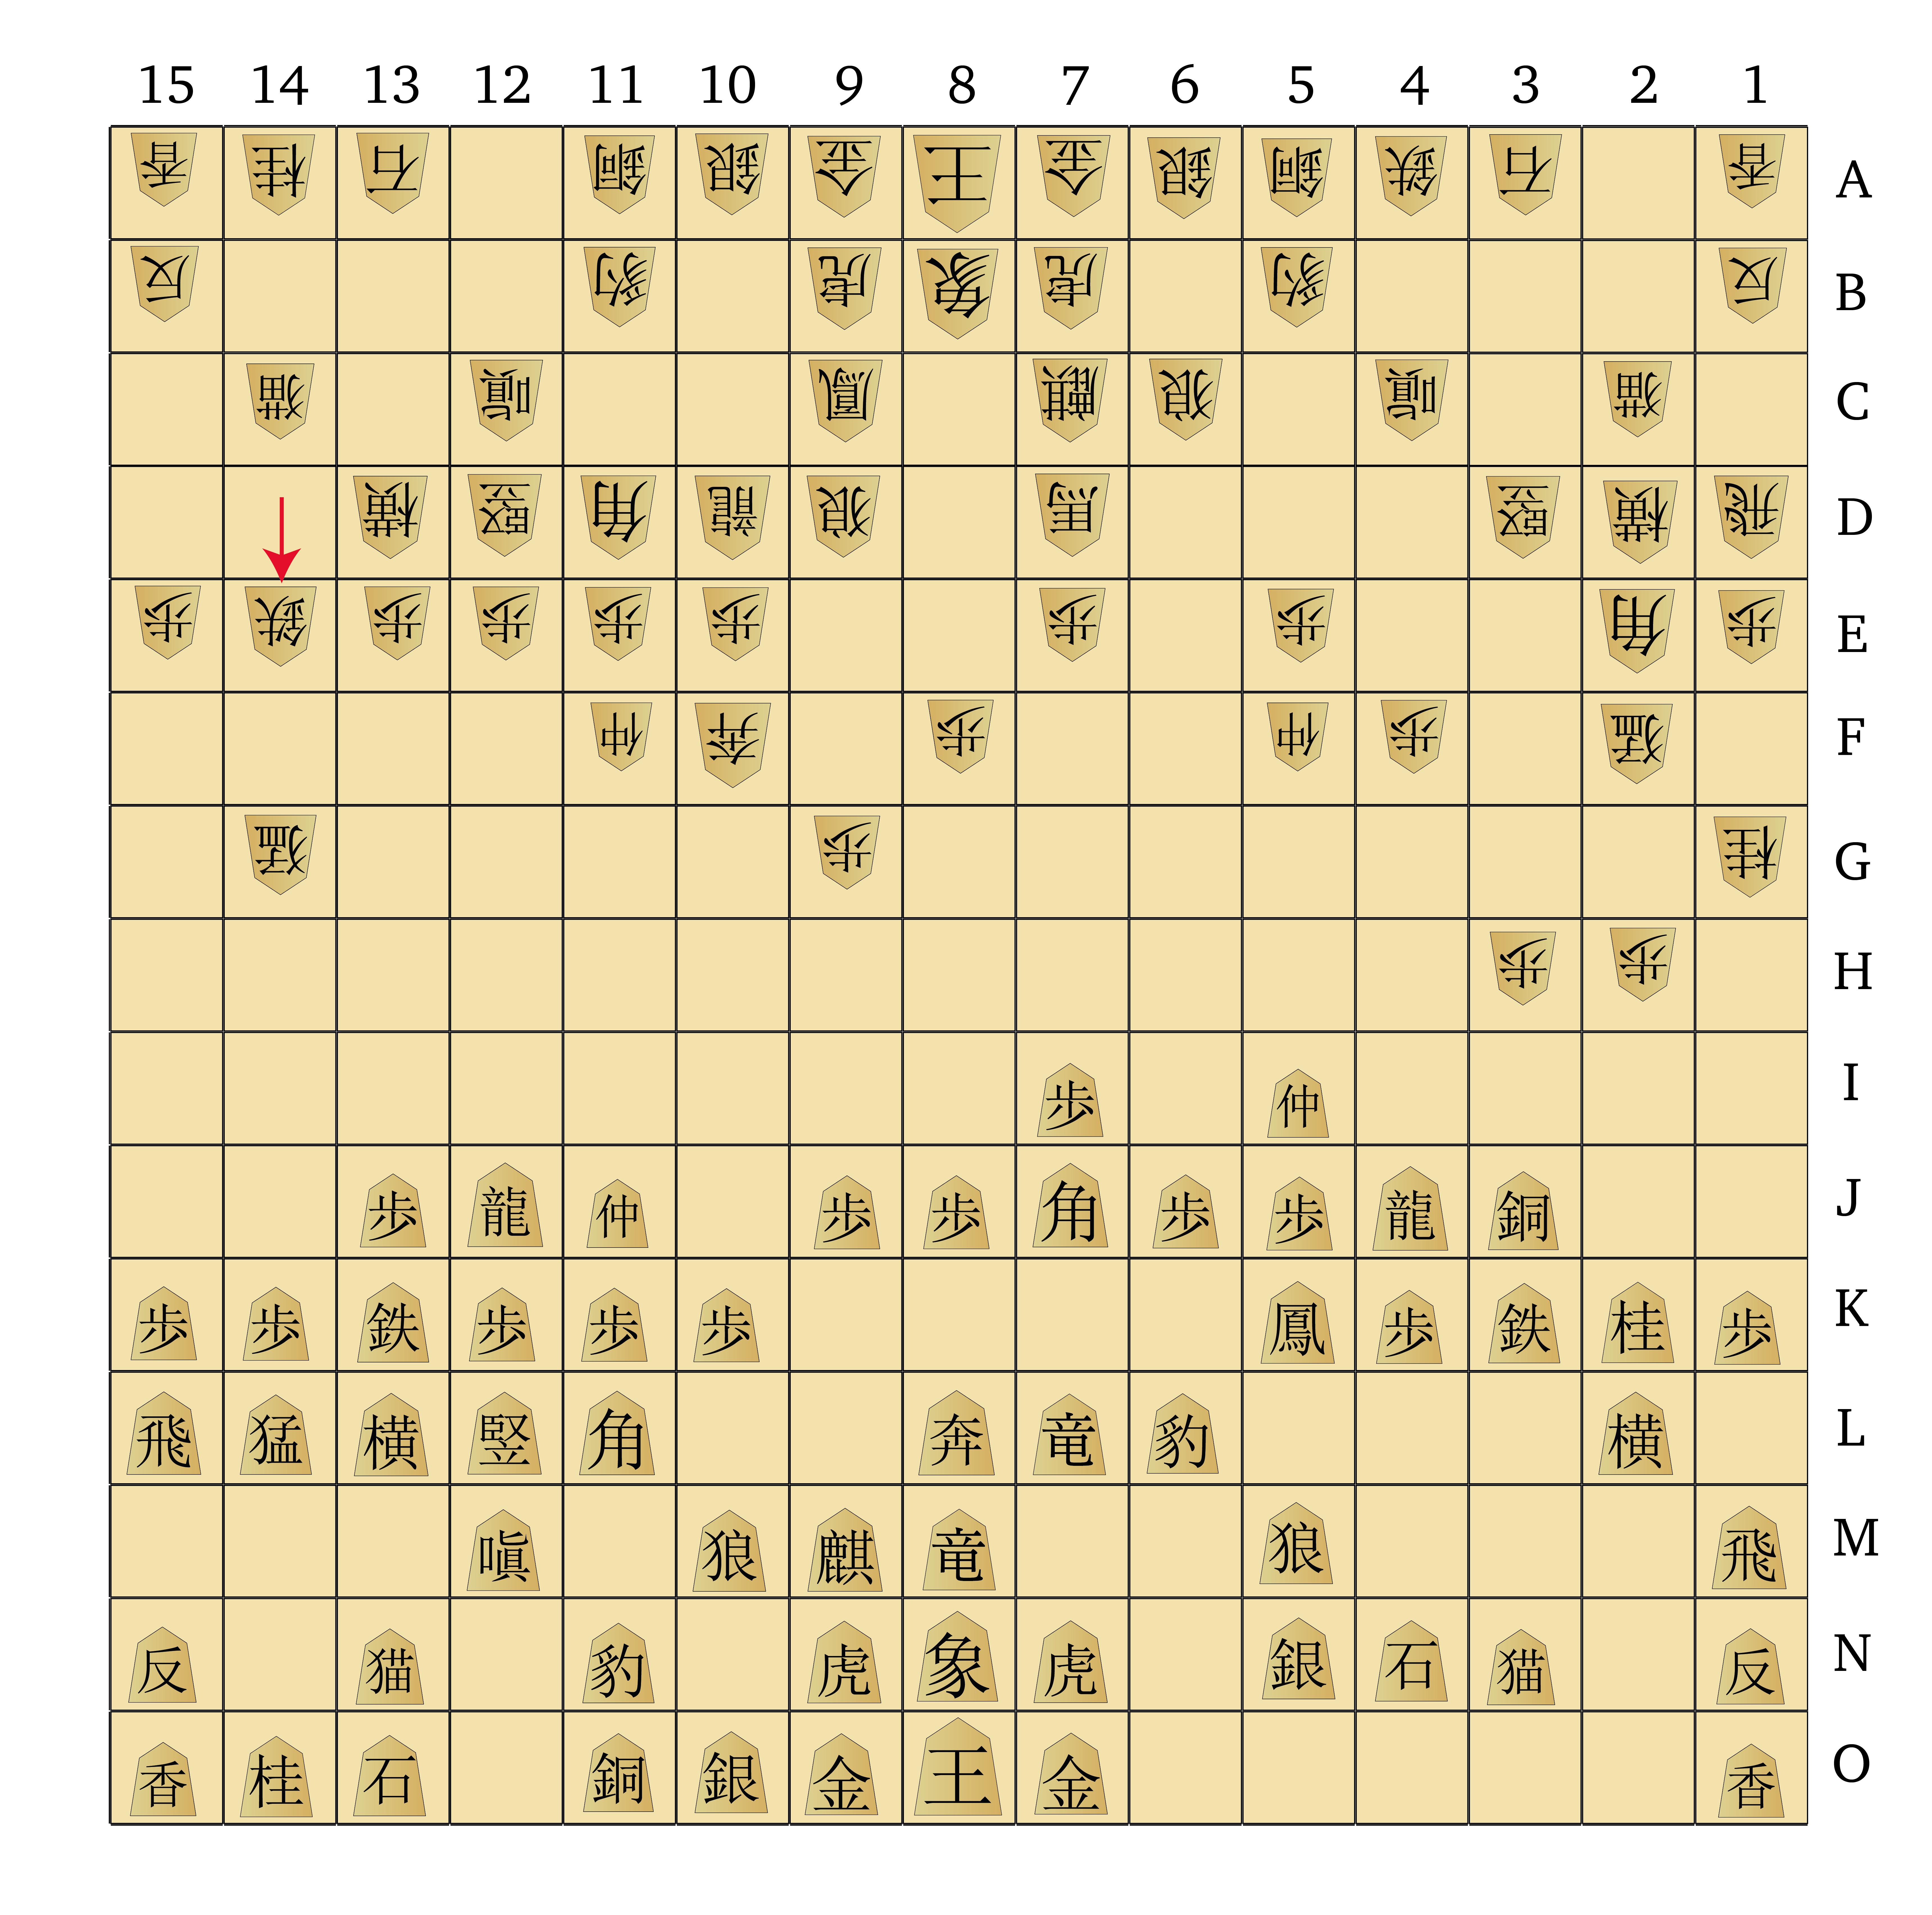 Dai Shogi 420 -- Move 120-01